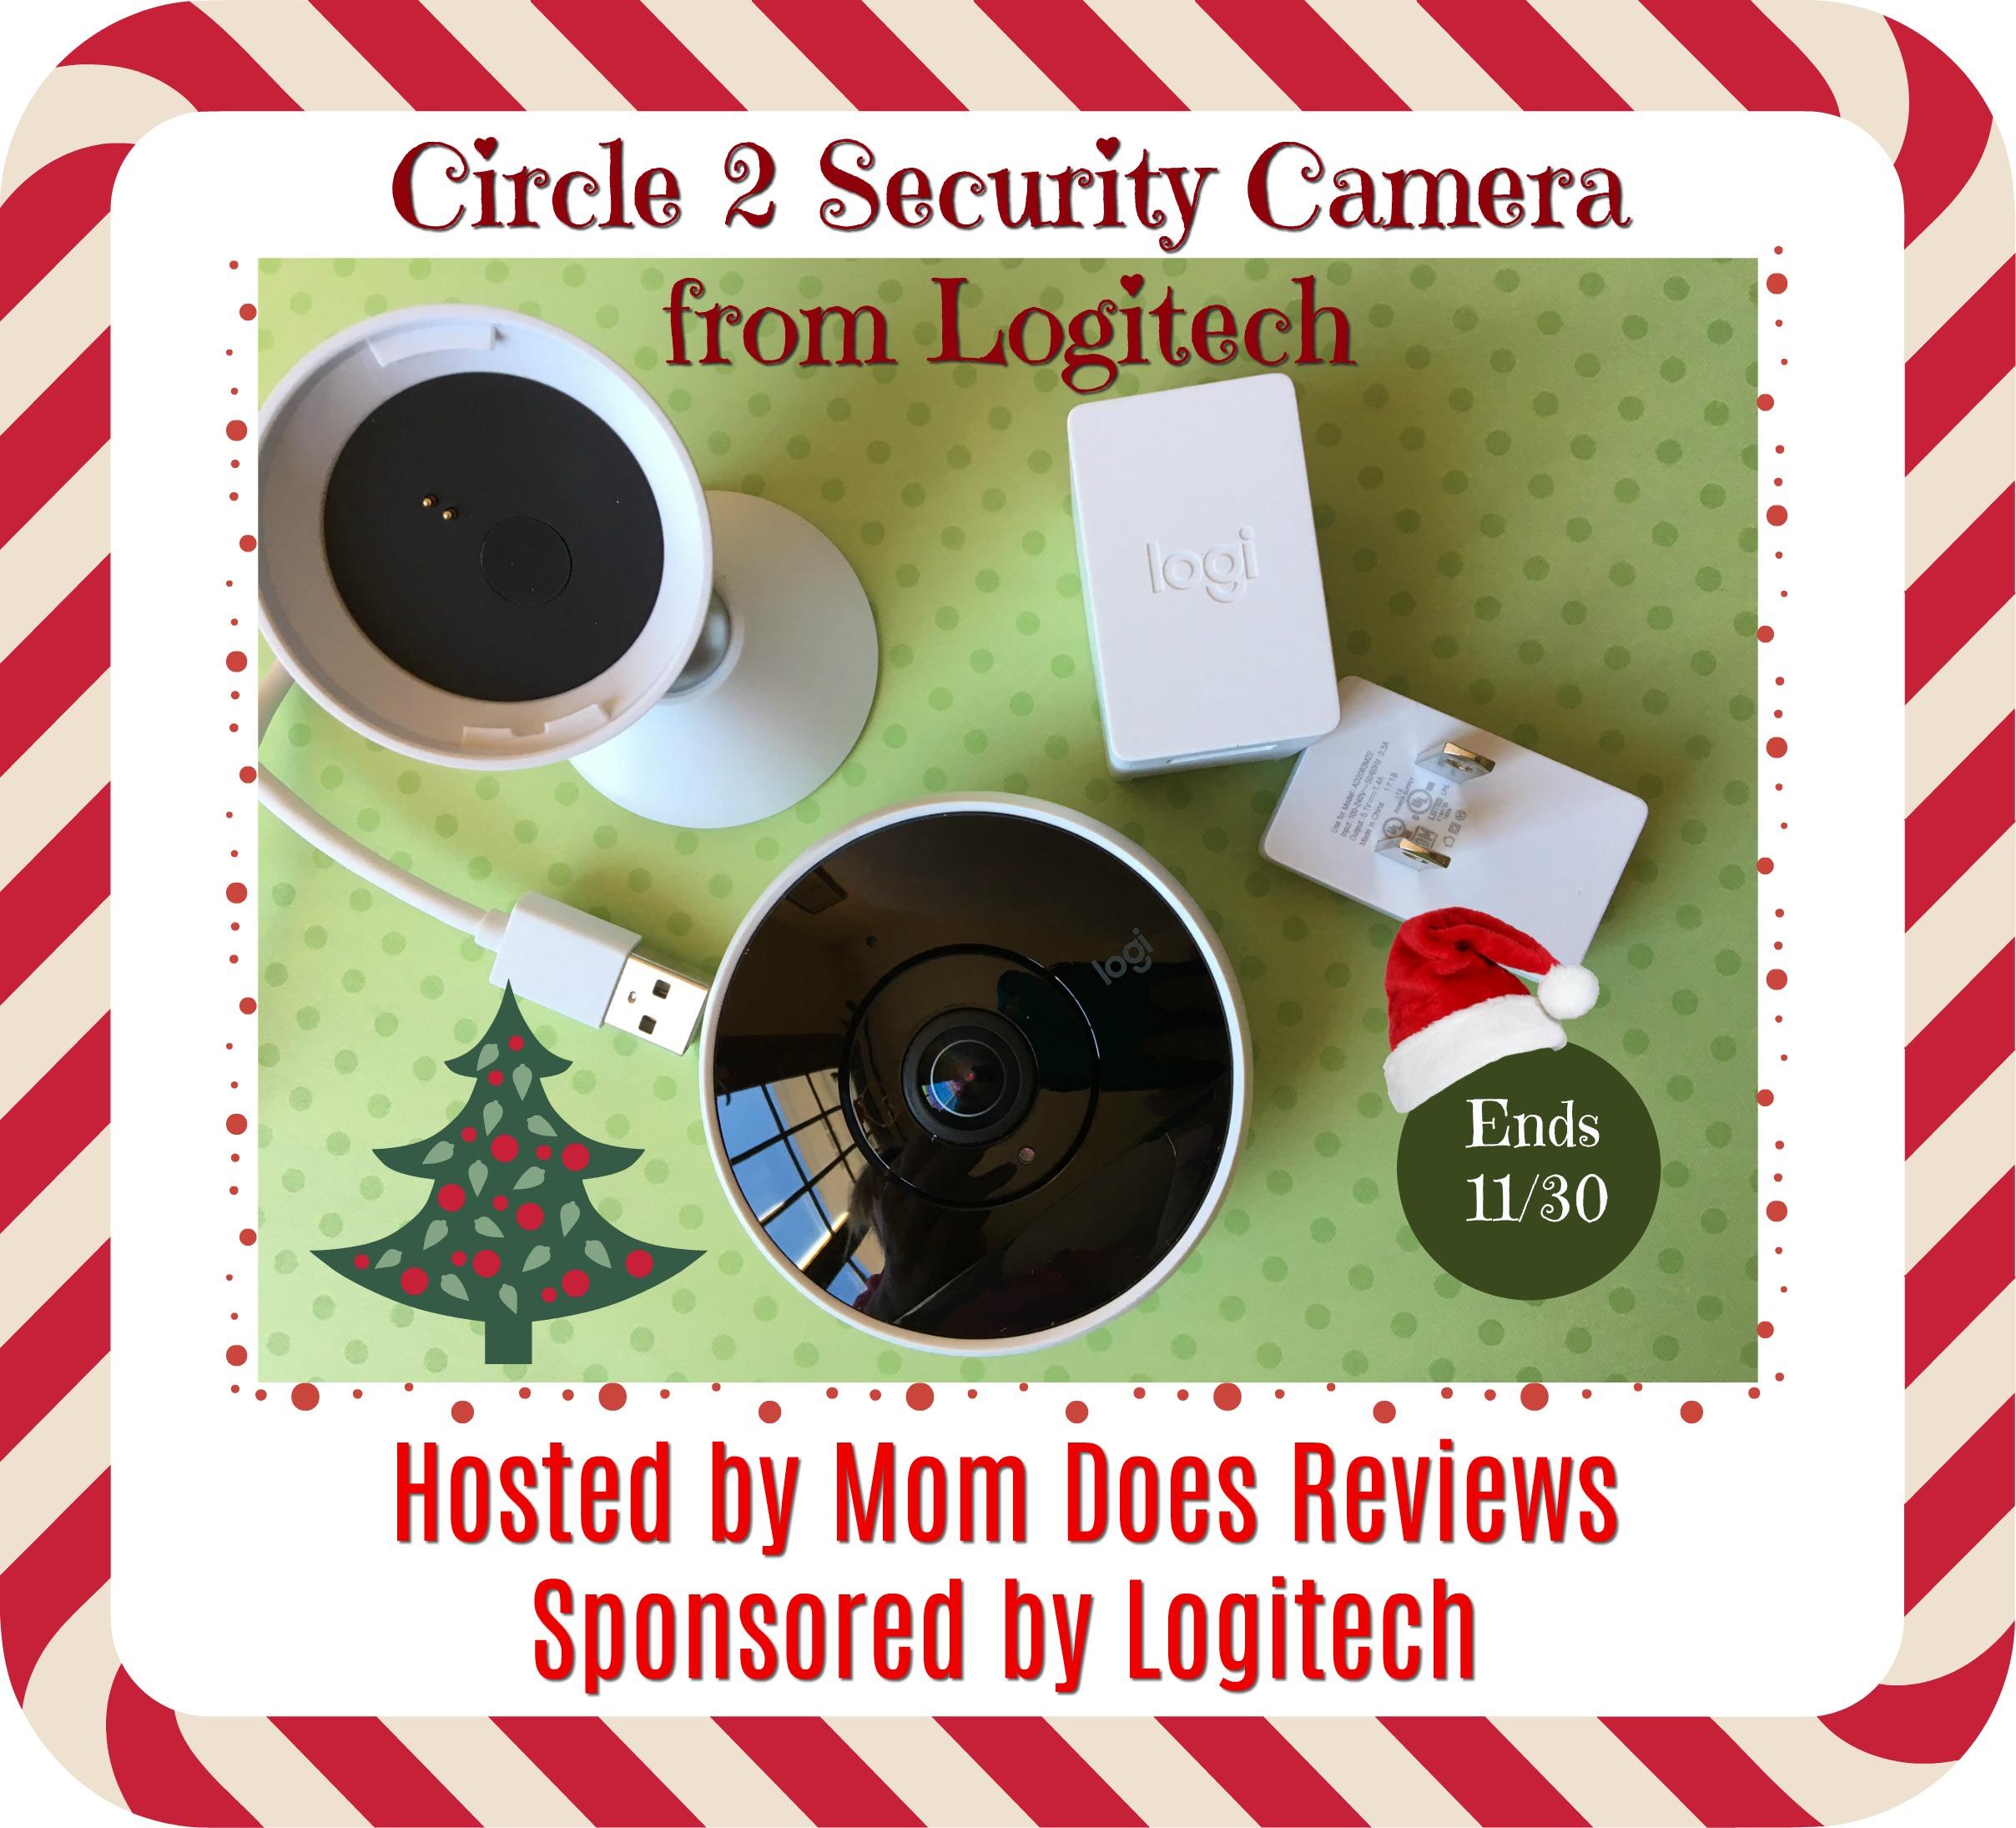 Logitech Giveaway